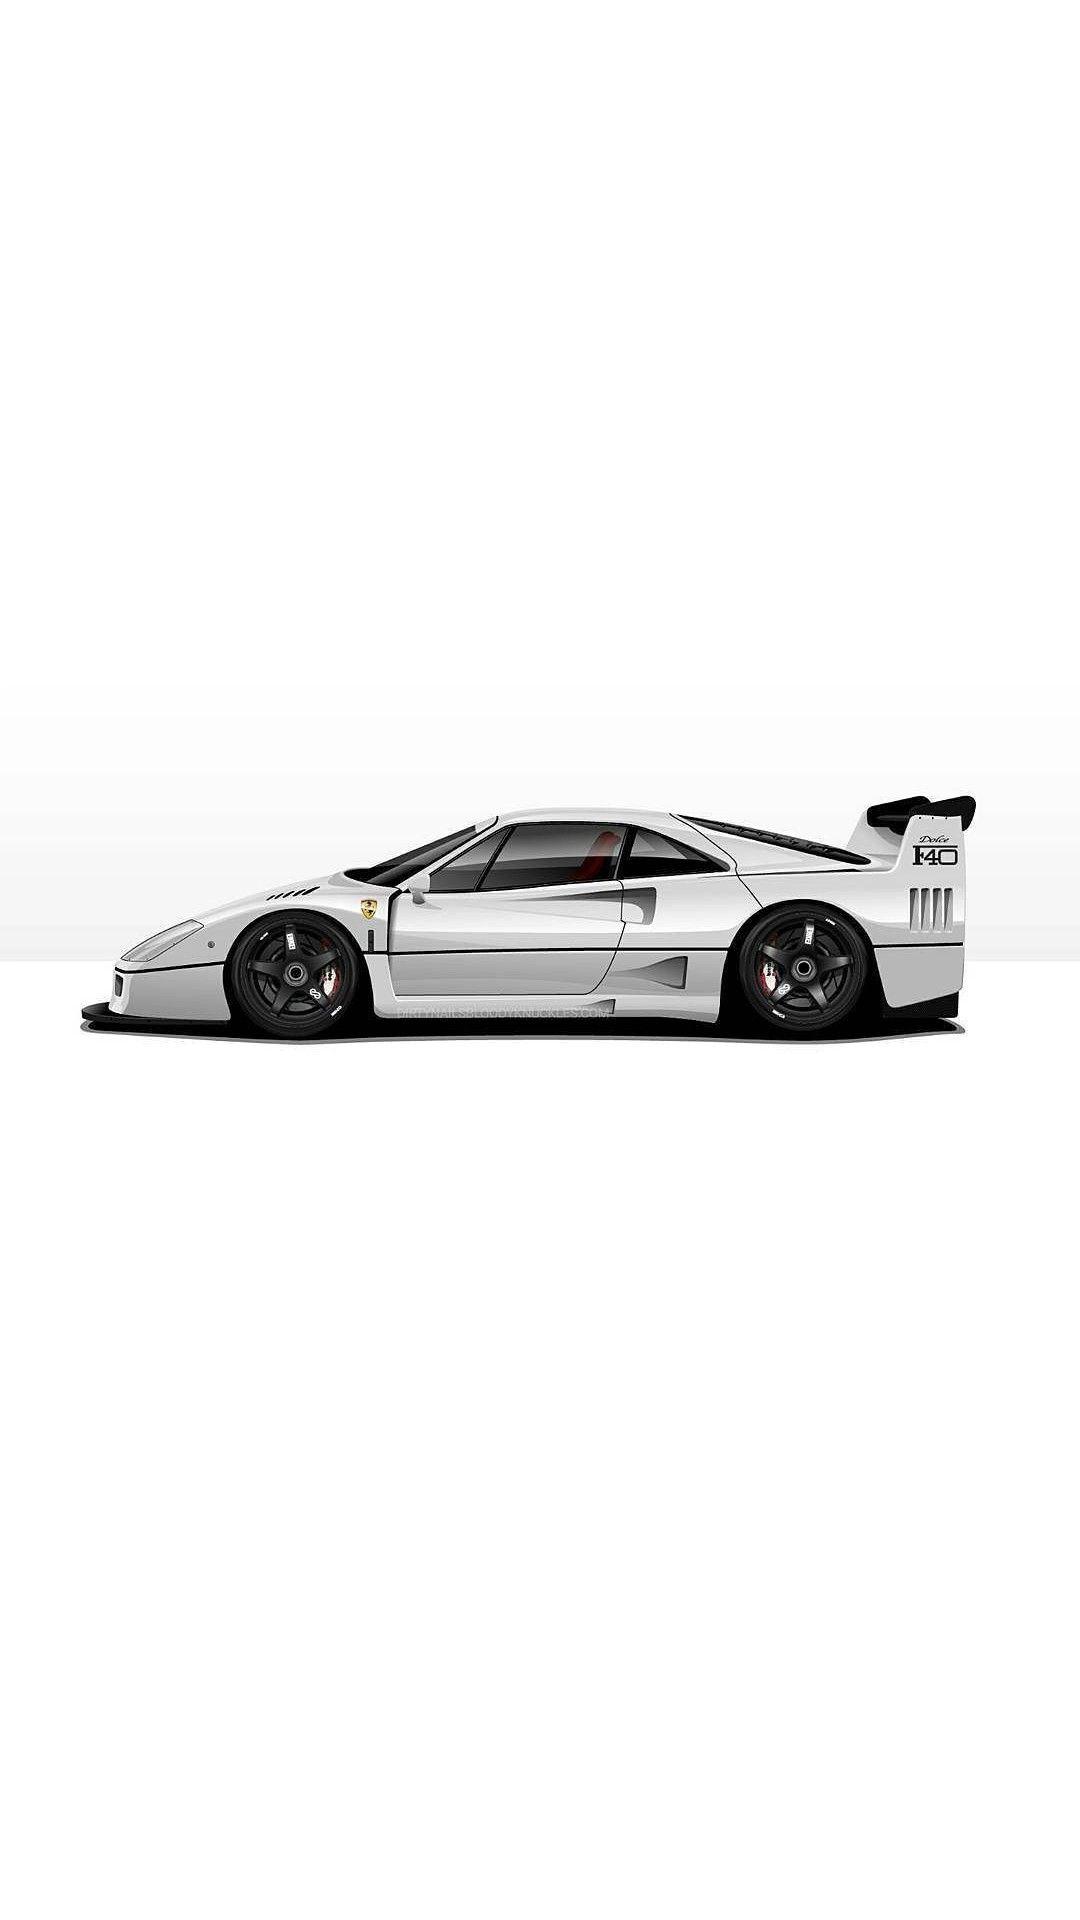 Ferrari F40 With Images Ferrari F40 Motor Car Car Art